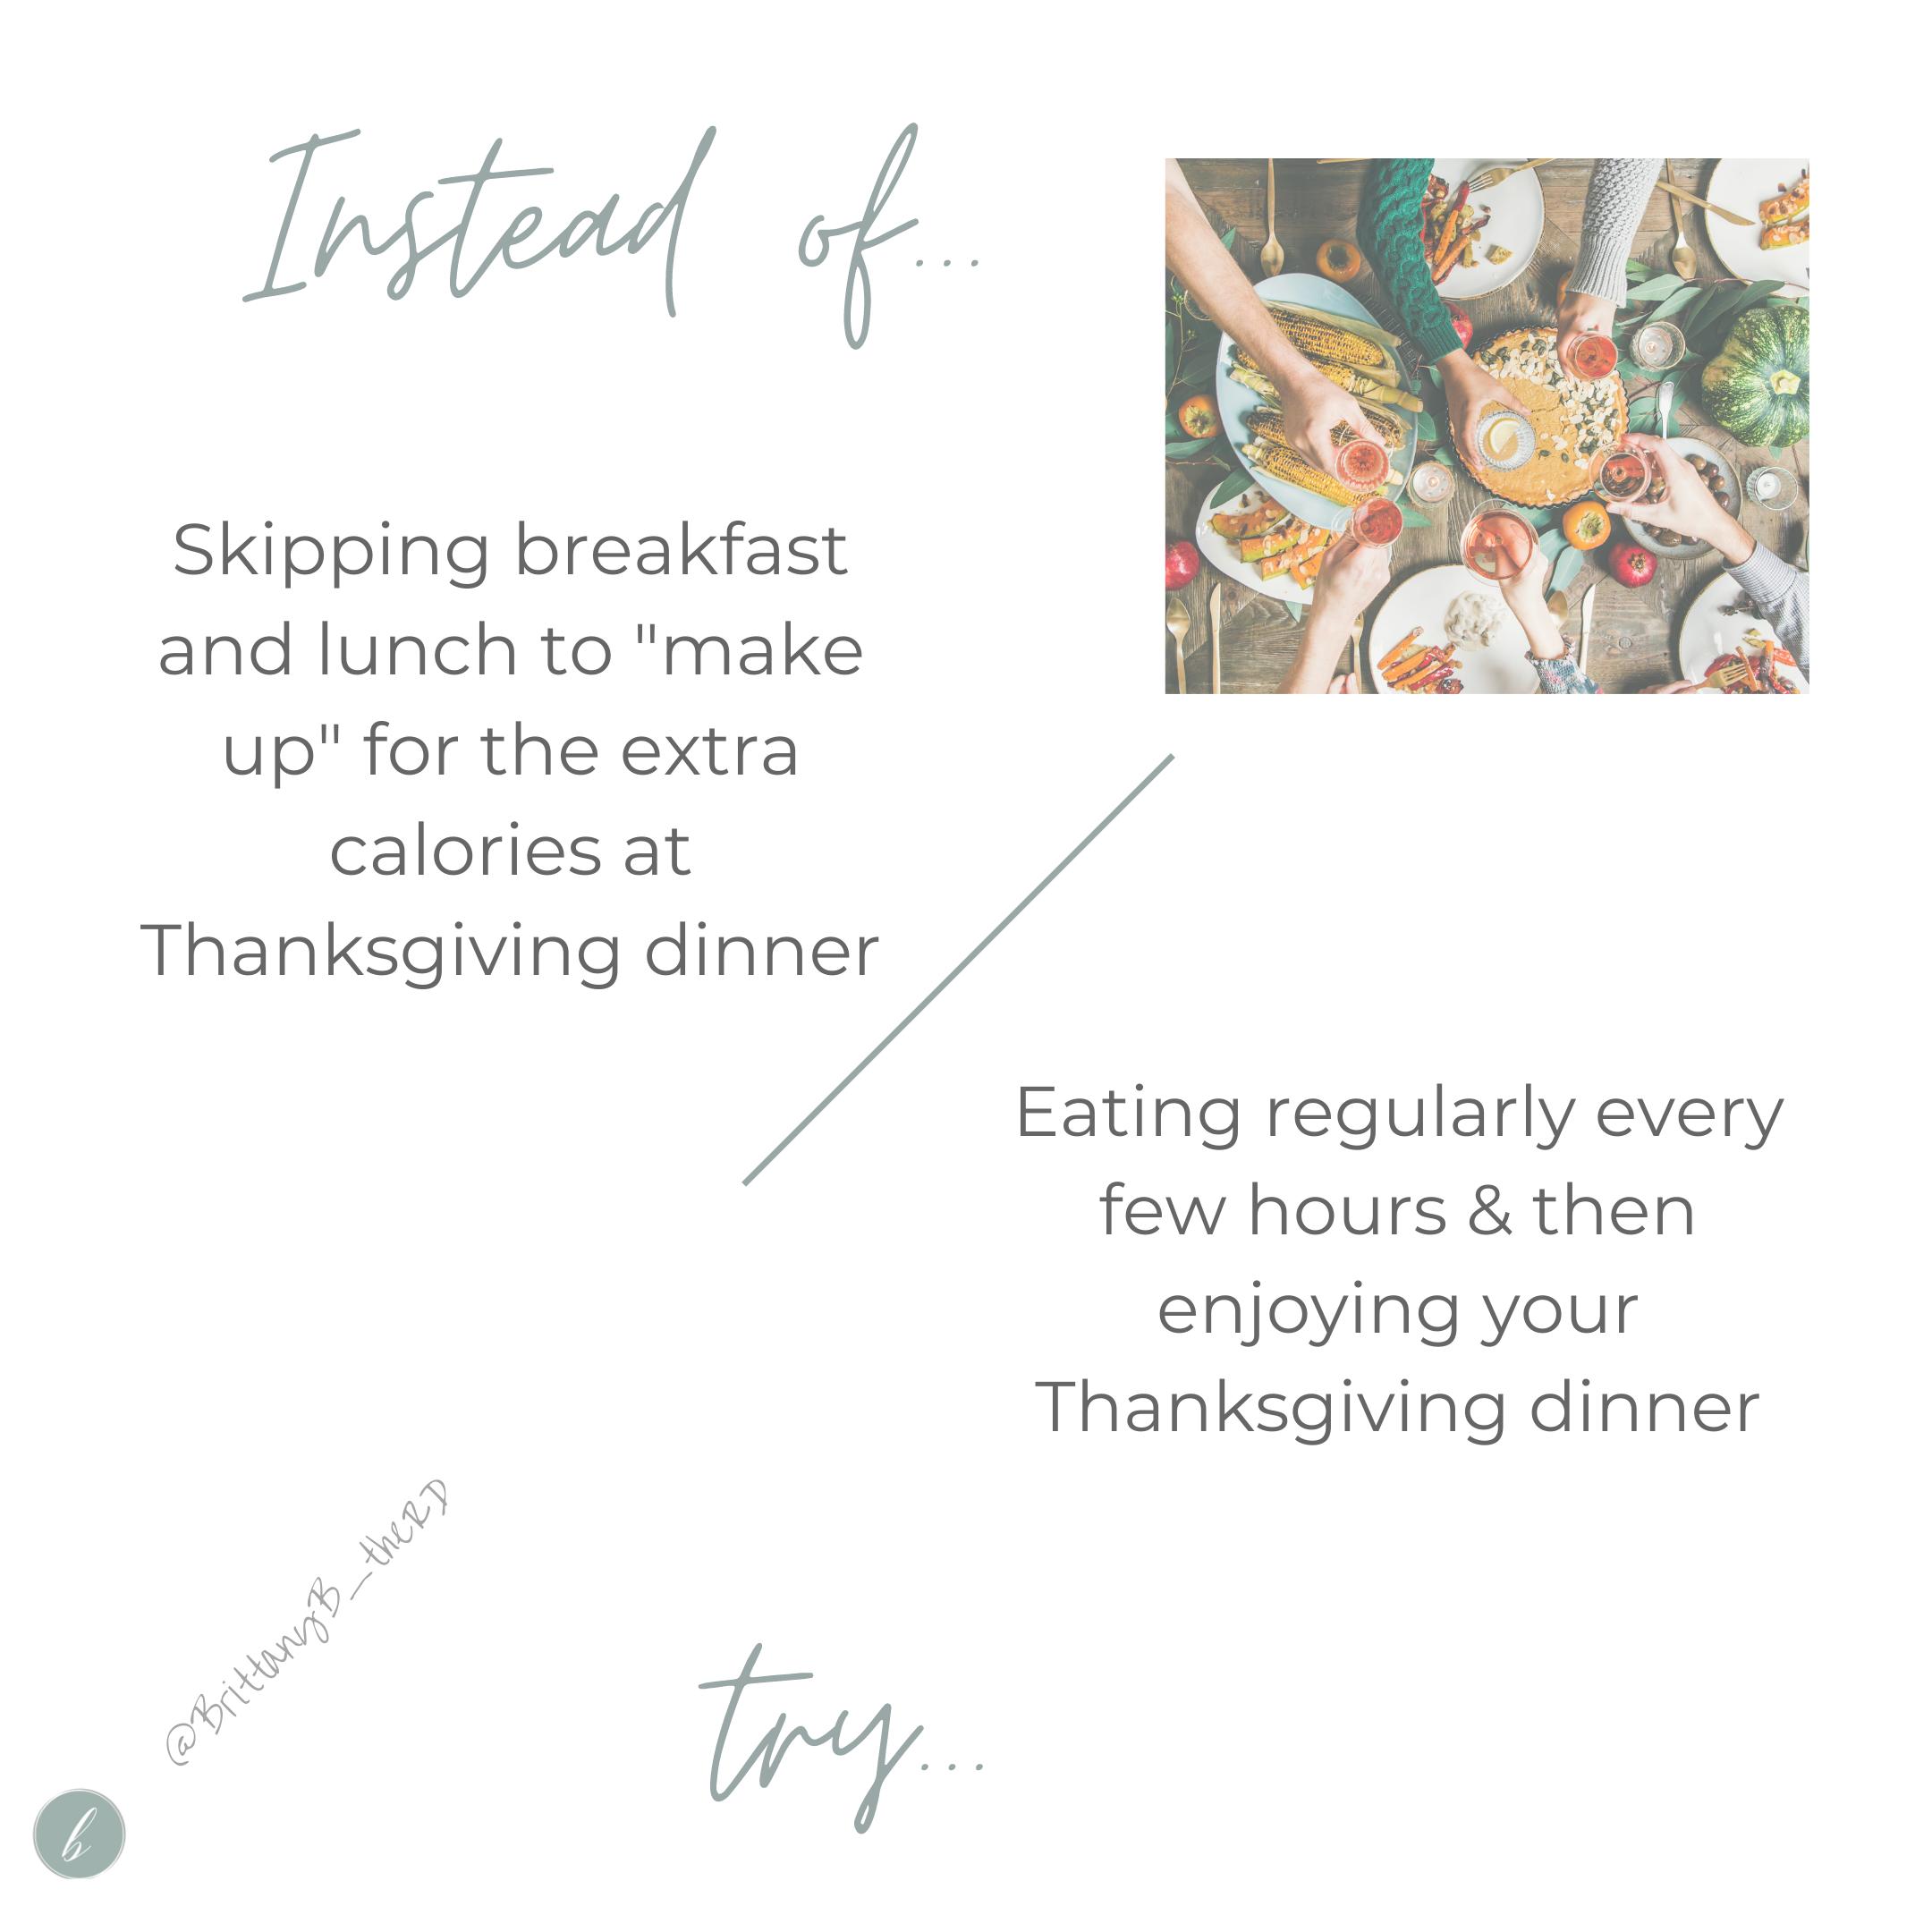 IBD skipping meals